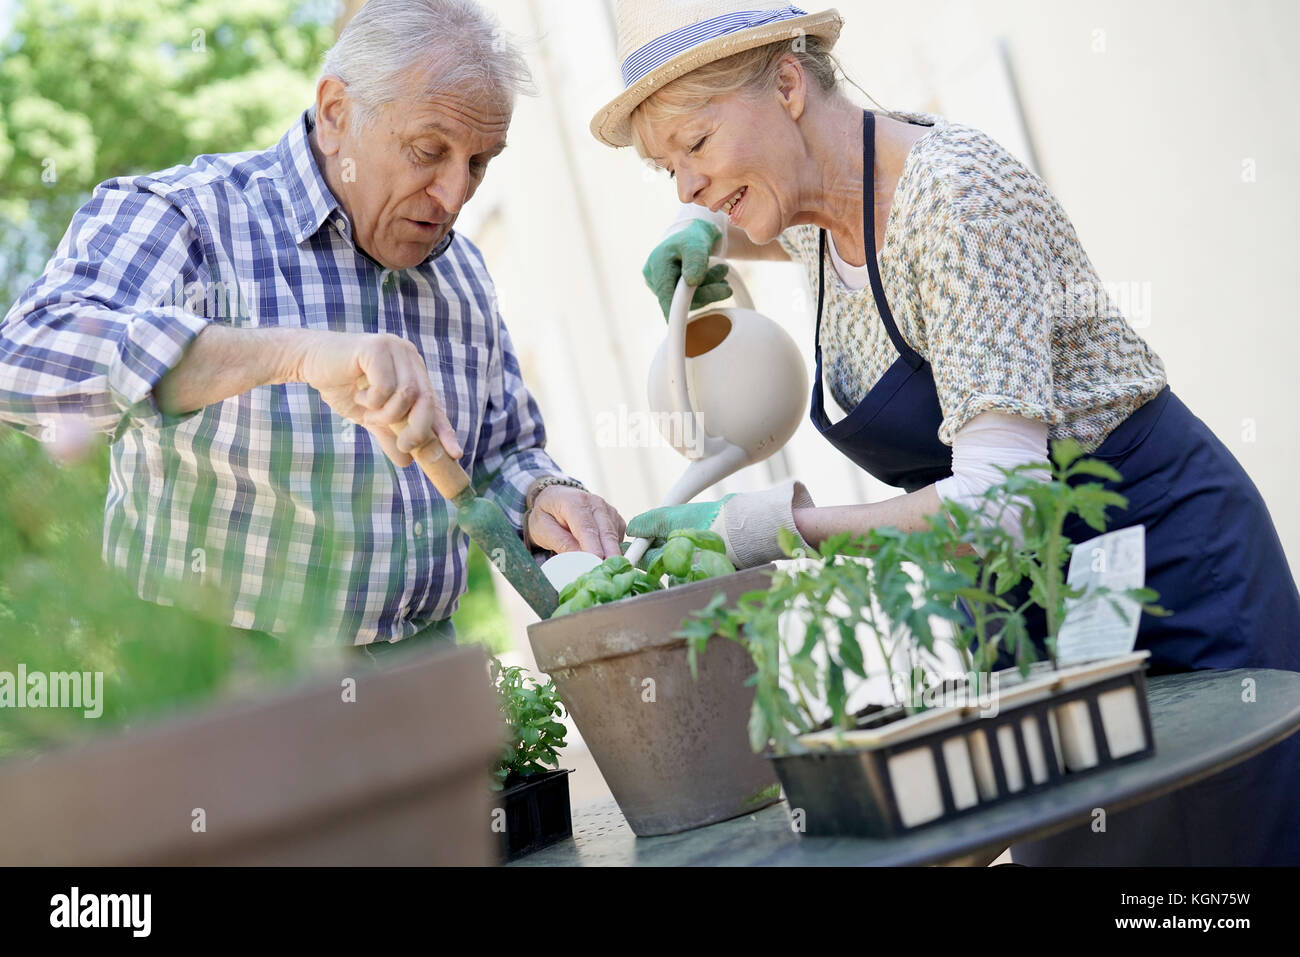 Senior couple planting aromatic herbs in pot - Stock Image